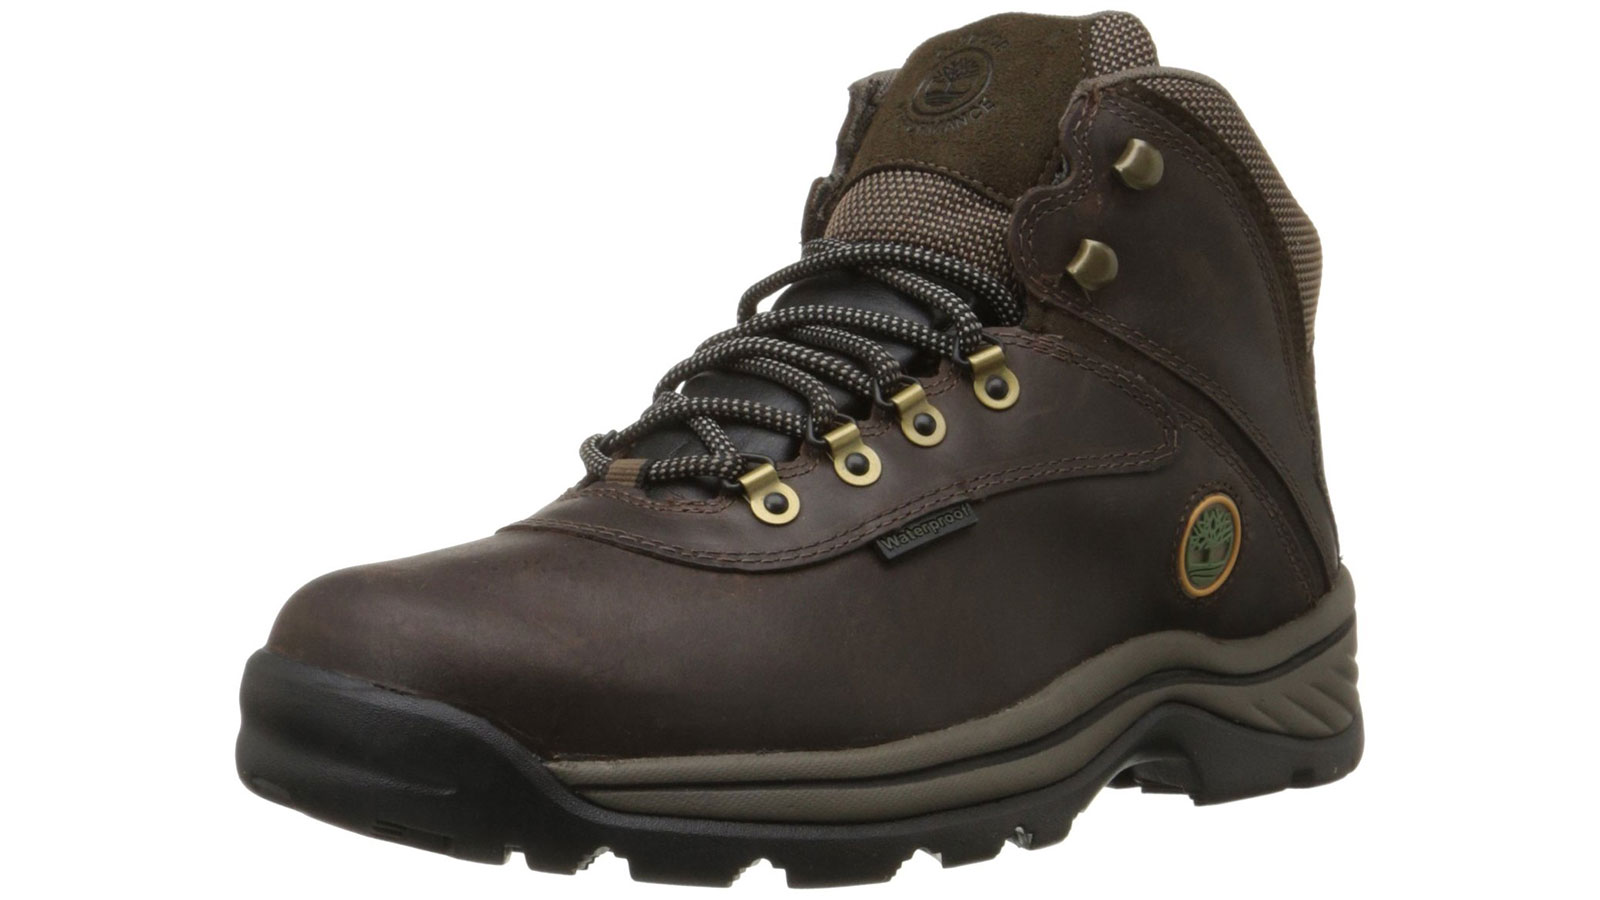 Timberland White Ledge Men's Waterproof Hiking Boot   the best men's waterproof boots